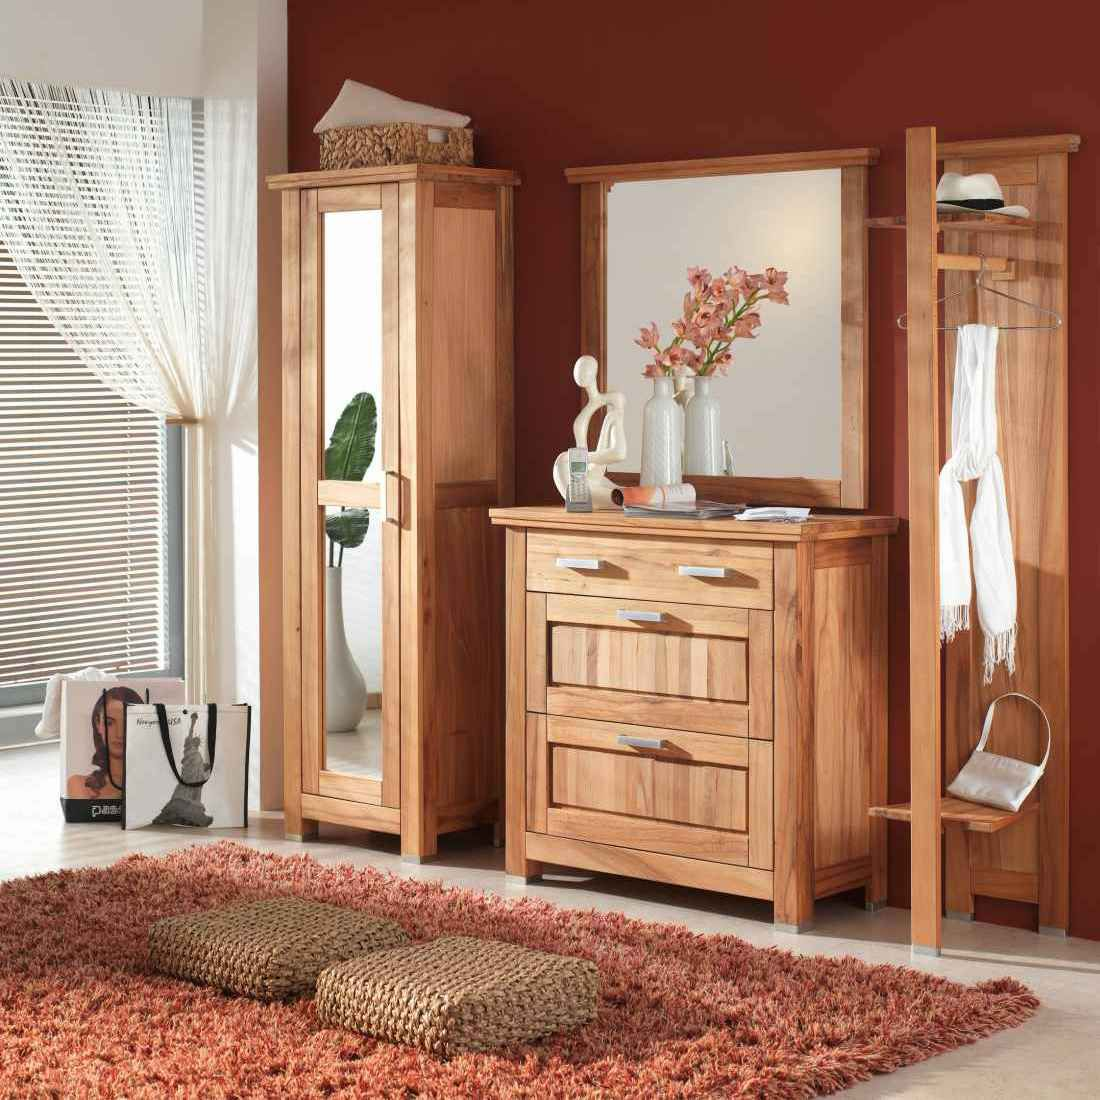 wandspiegel g nstig kaufen. Black Bedroom Furniture Sets. Home Design Ideas